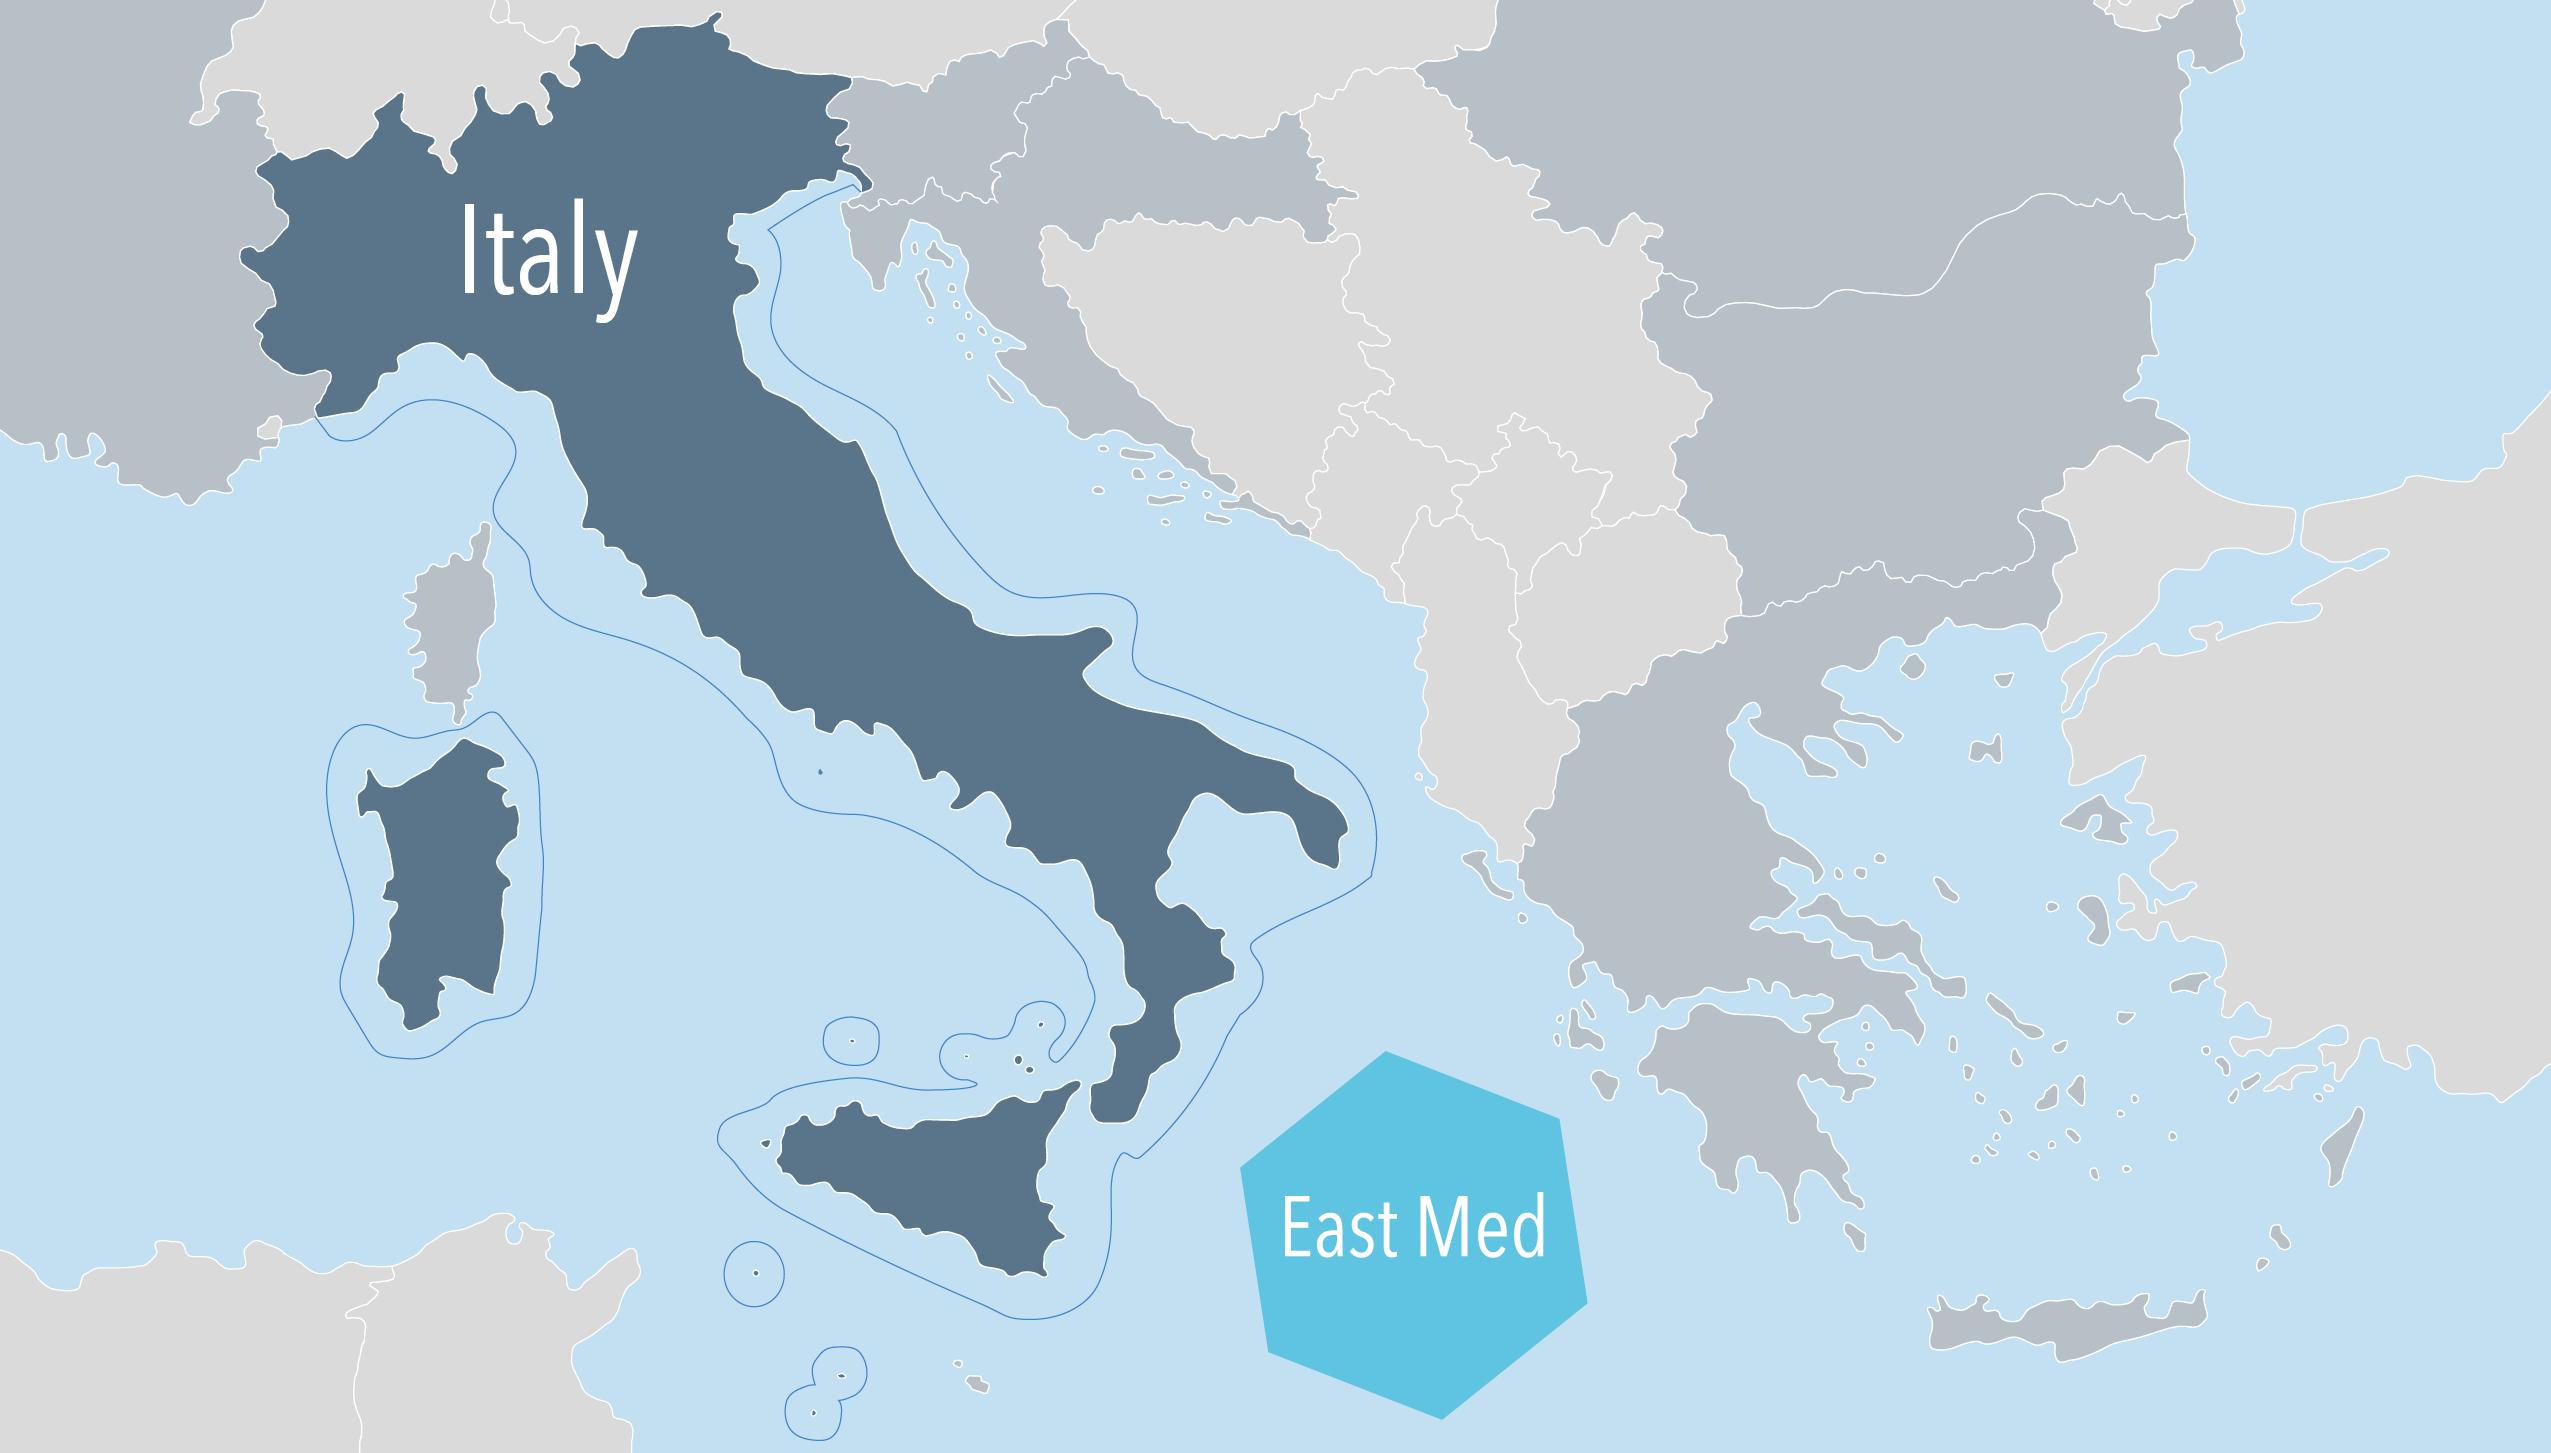 Basic Map Of Italy.Italy European Msp Platform